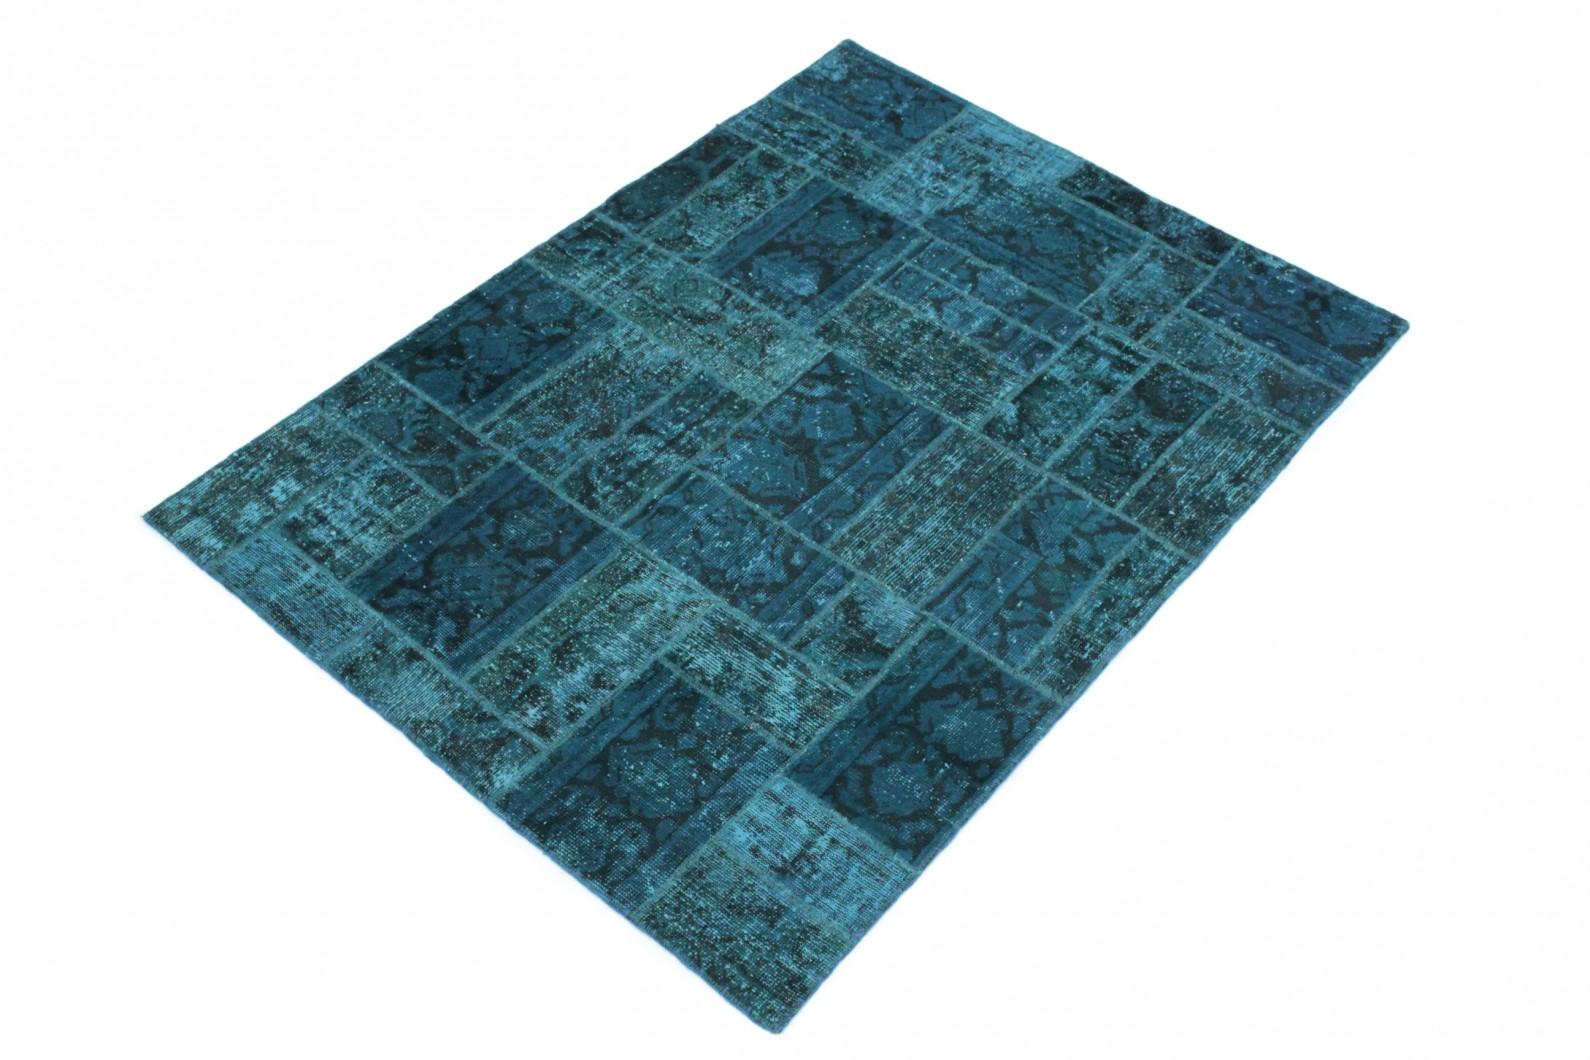 patchwork teppich blau in 200x150 1001 167074 bei. Black Bedroom Furniture Sets. Home Design Ideas